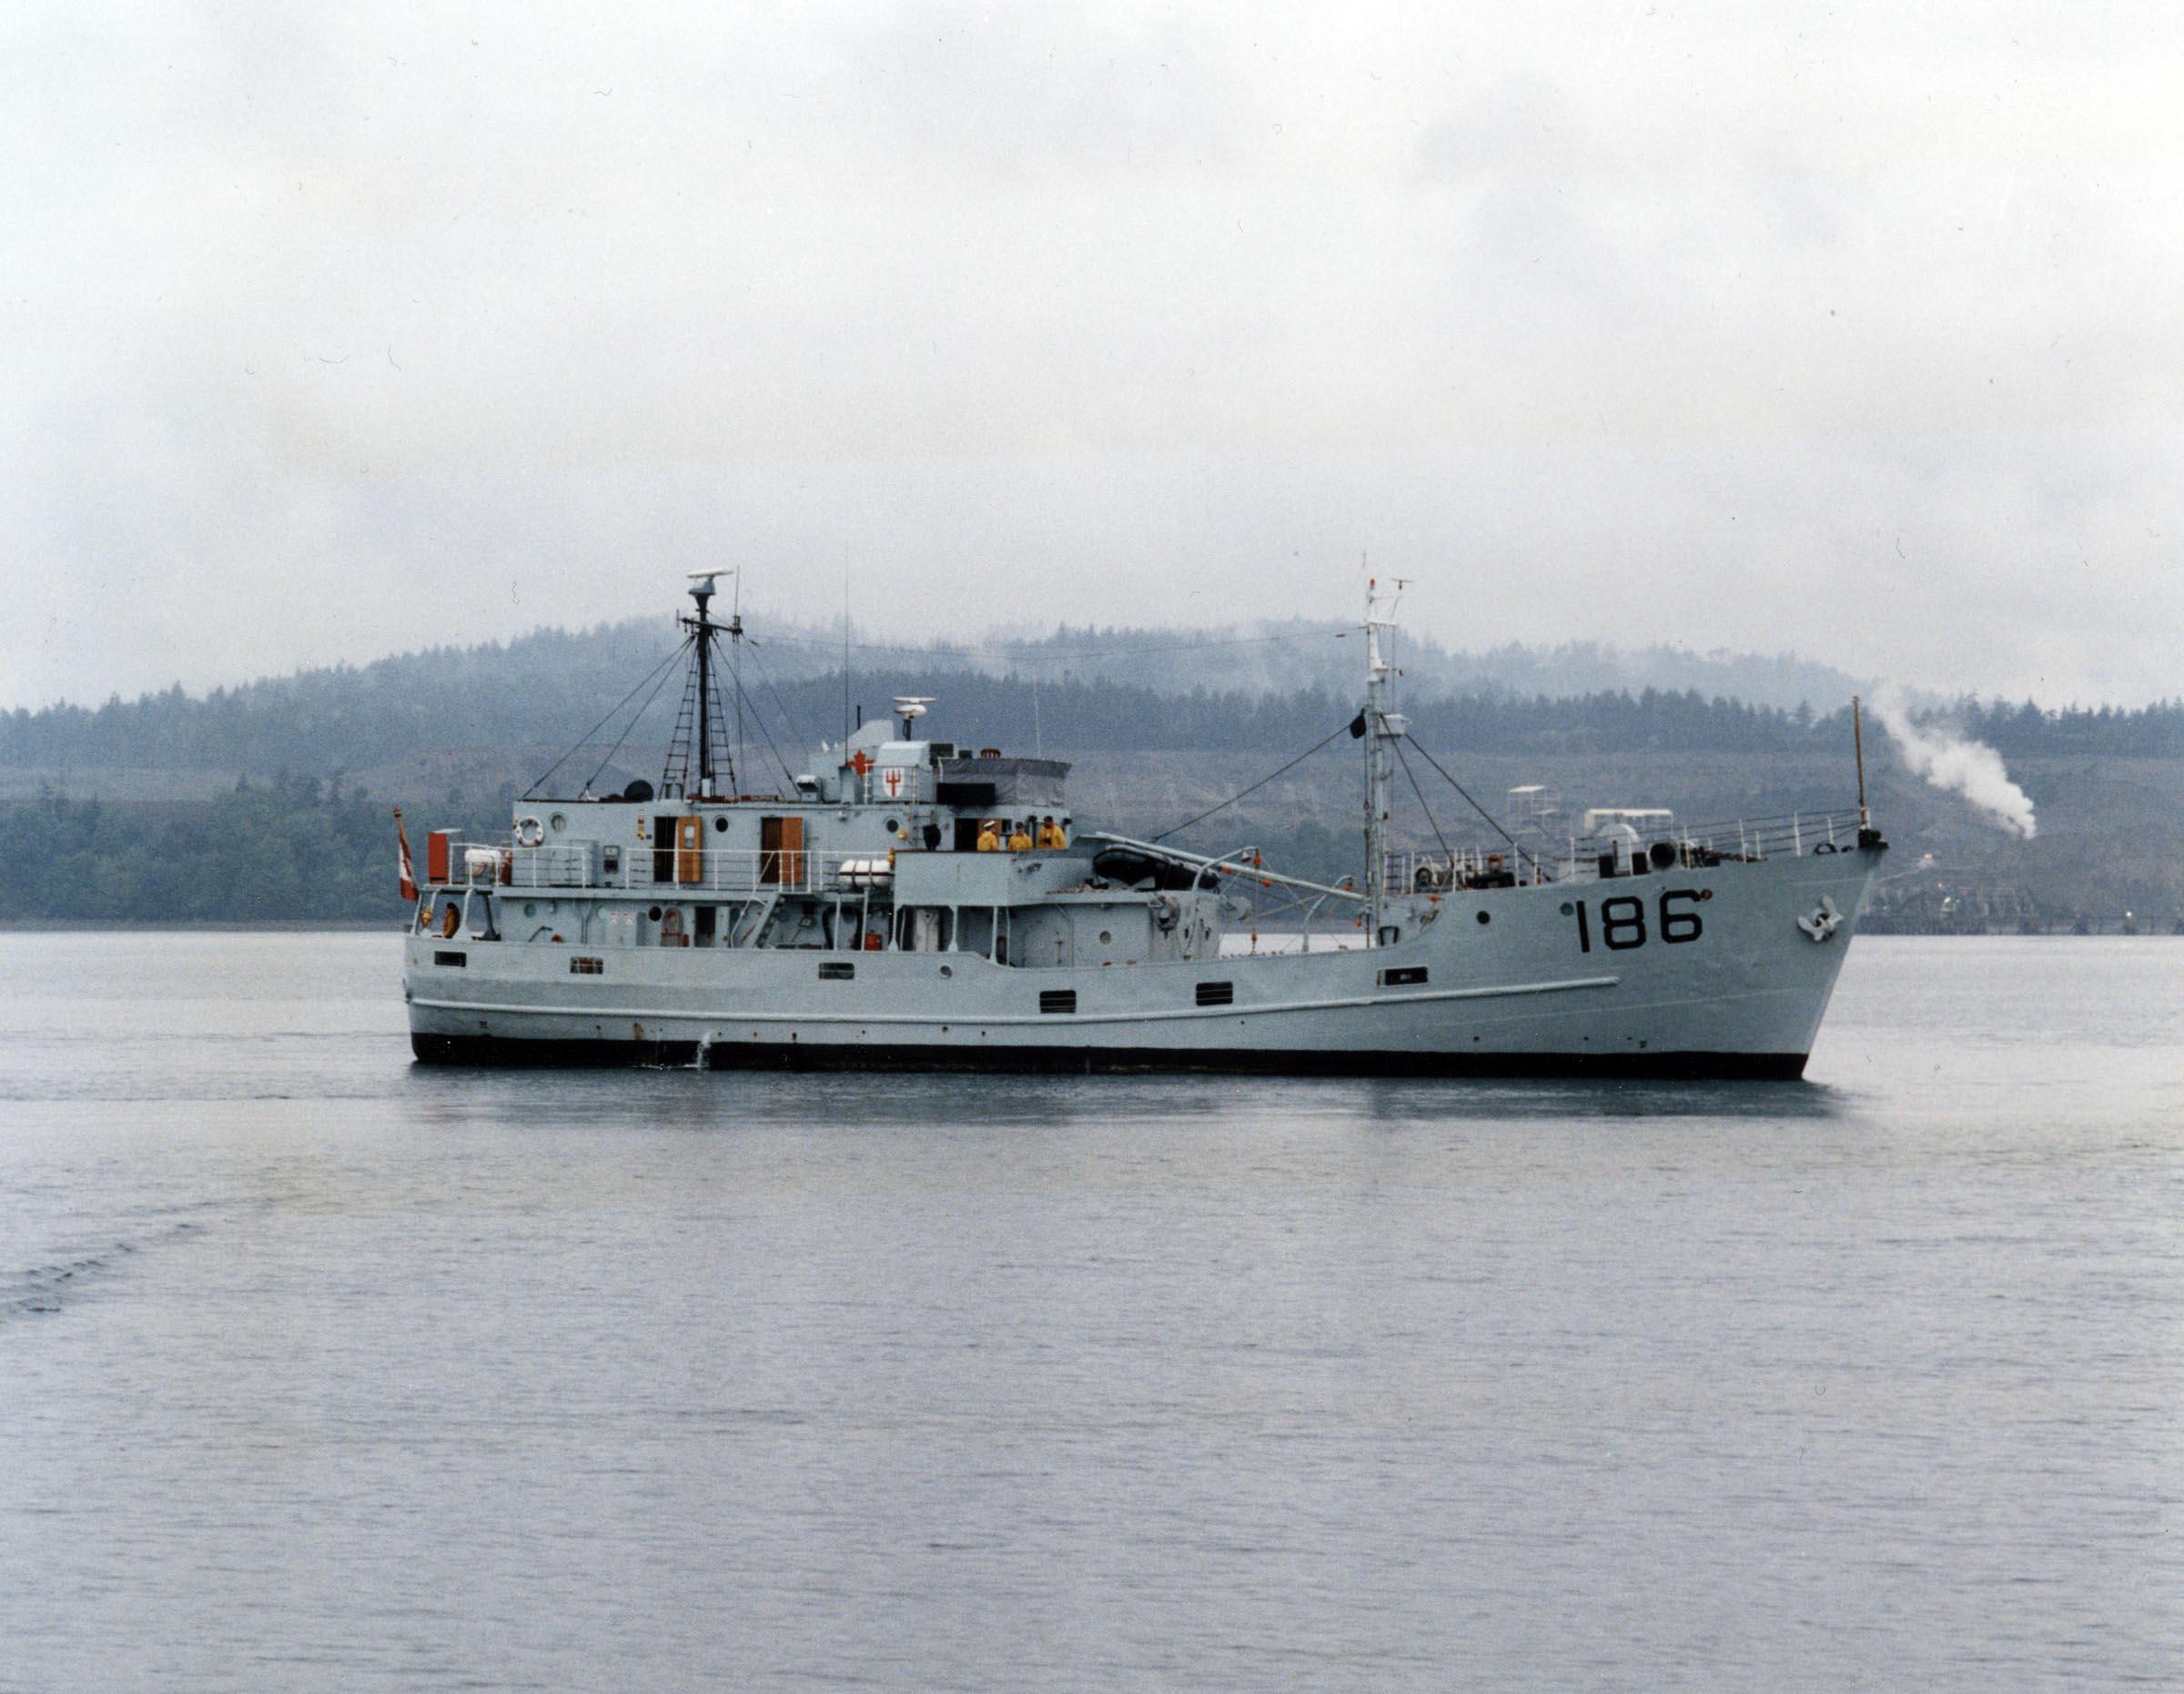 HMCS PORTE DAUPHINE